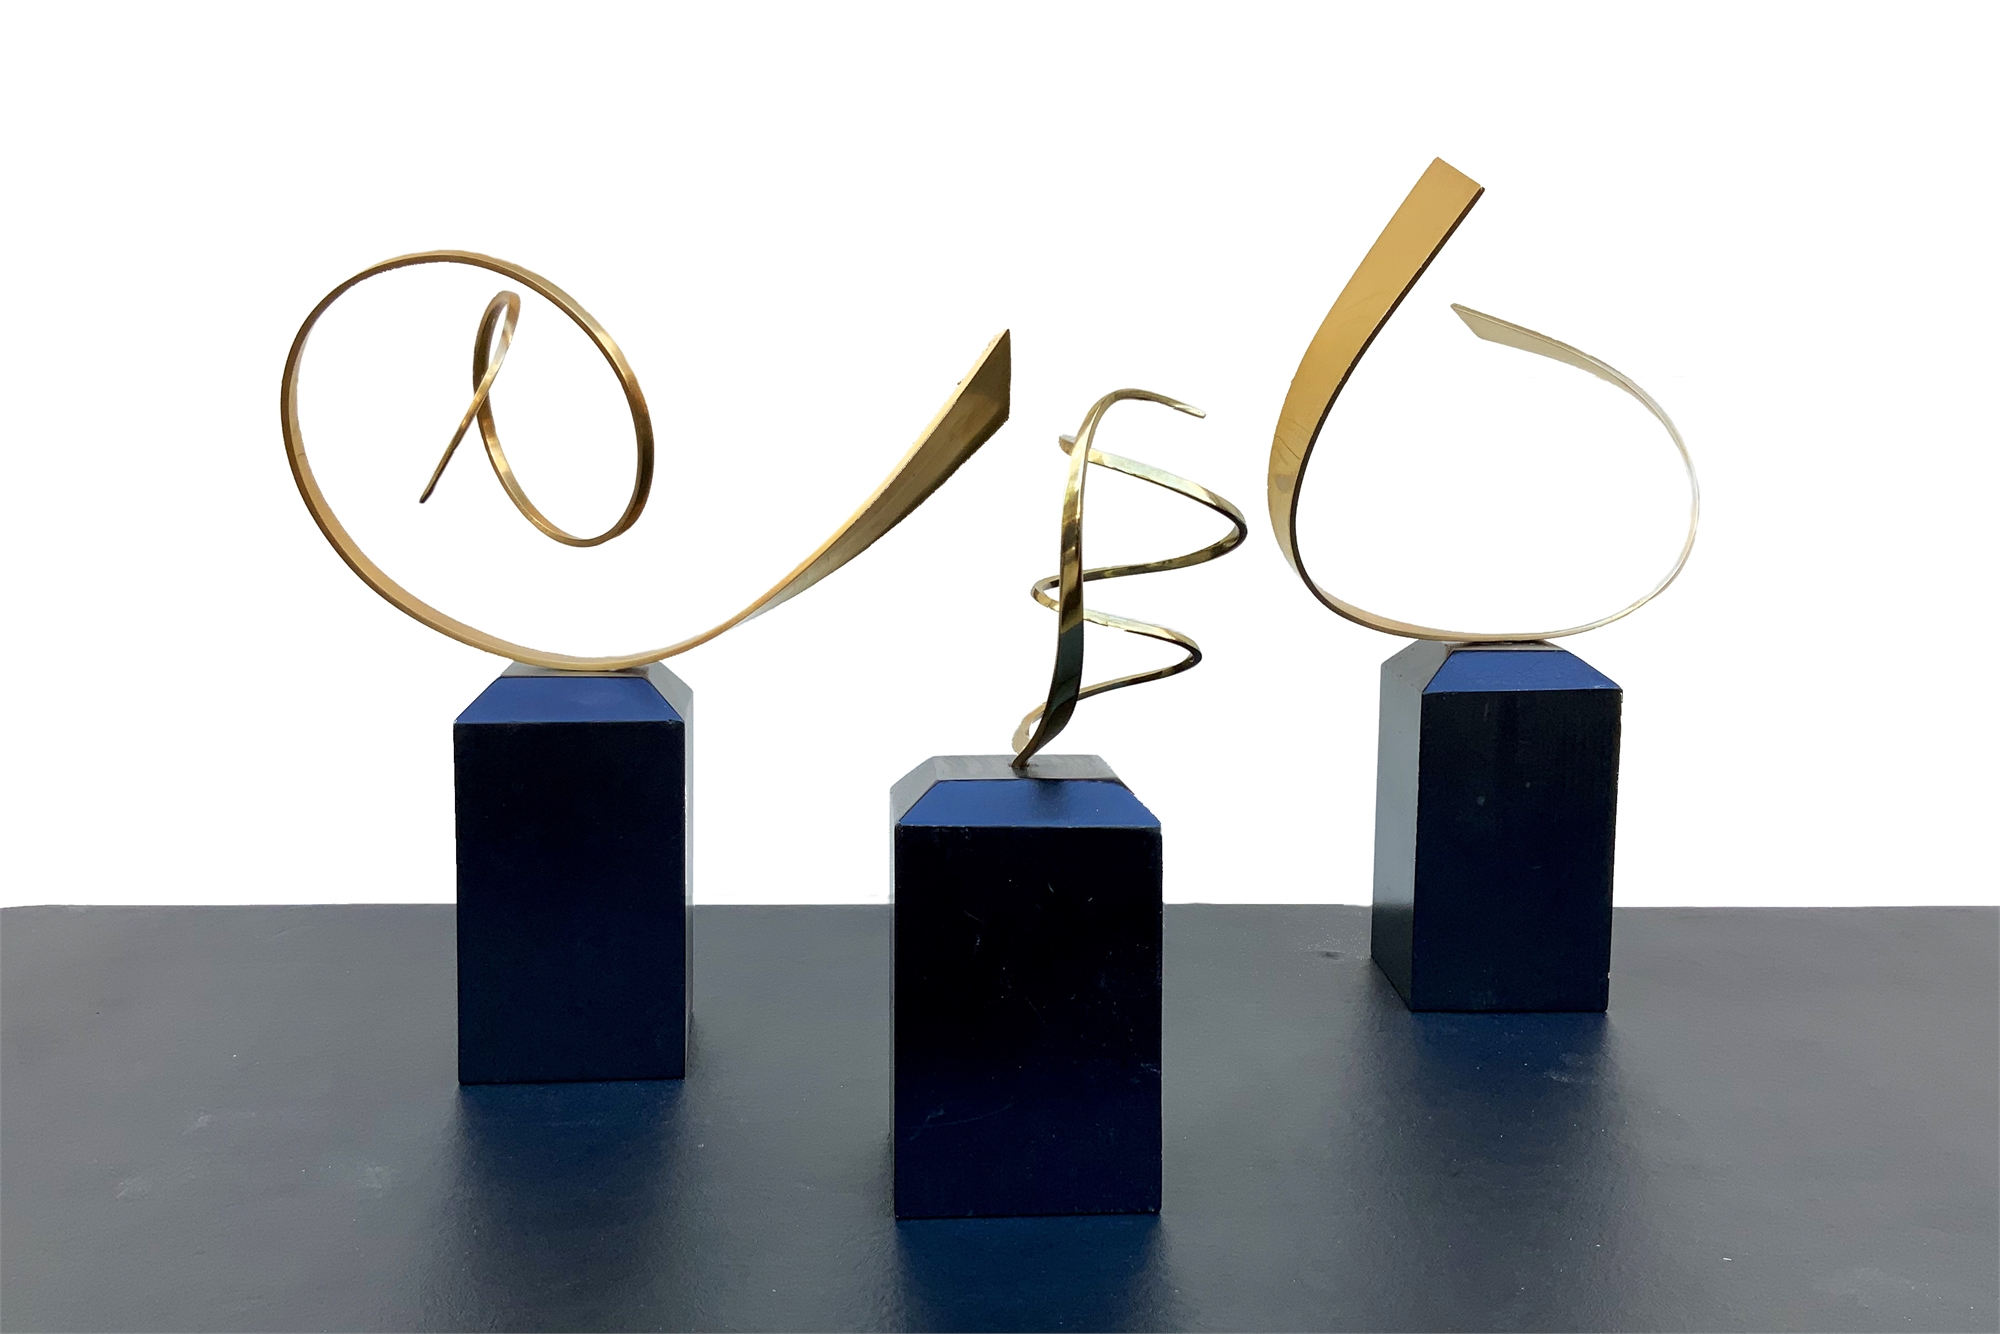 Sculpture 2 by Martin Conley (Hillsboro, OR)